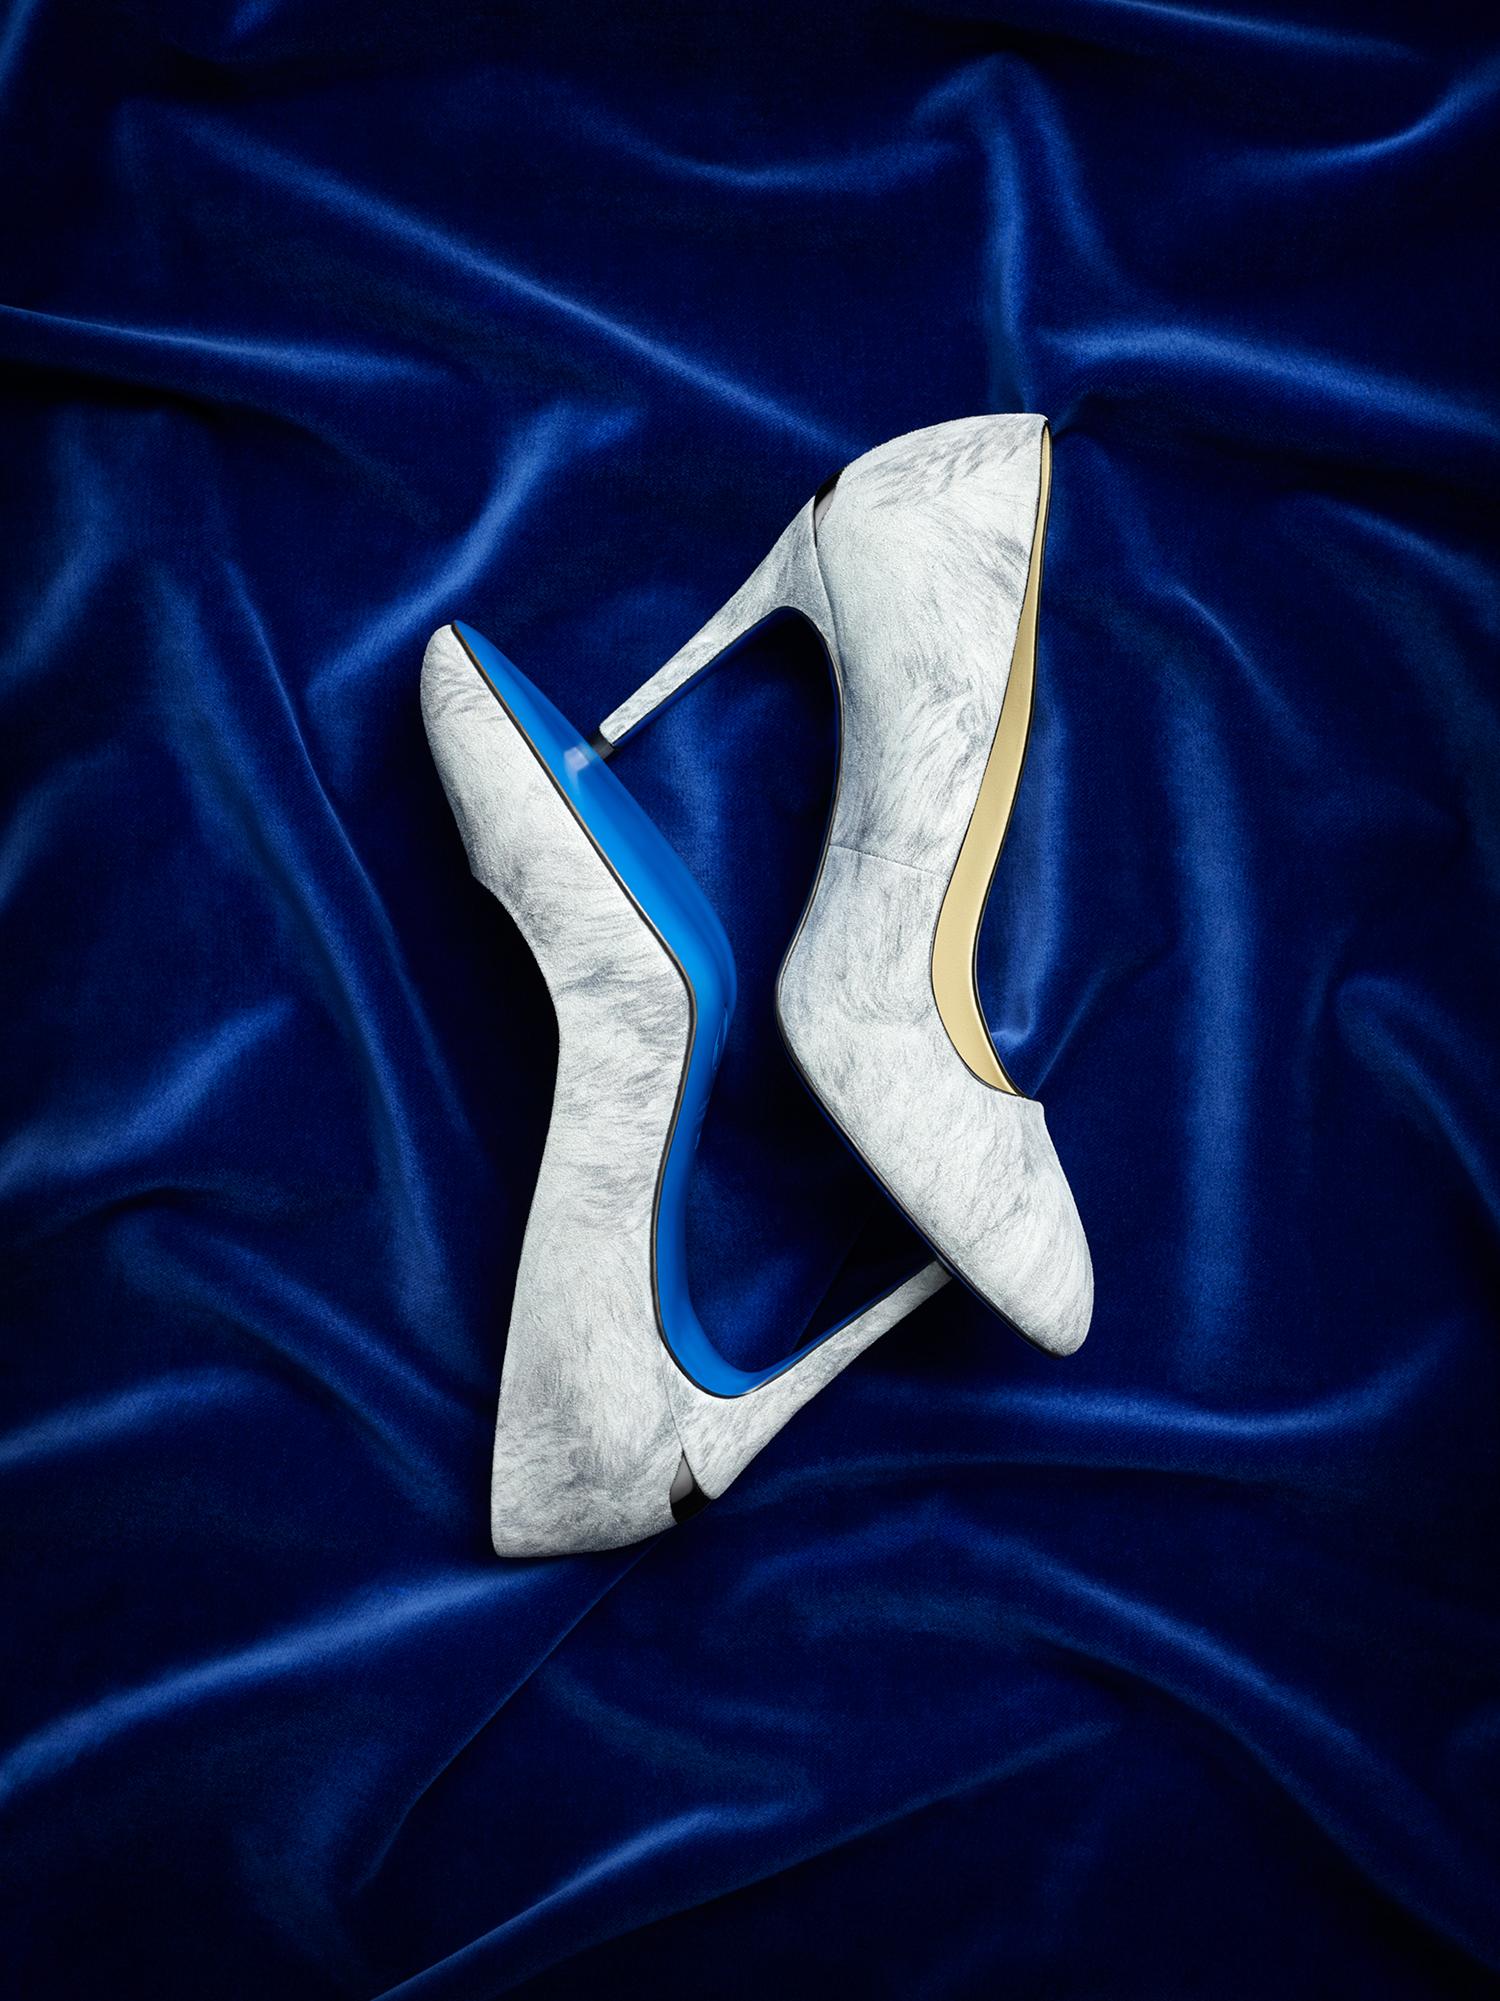 Senkpiel Shoes Web Format STER wolf-1-8.jpg